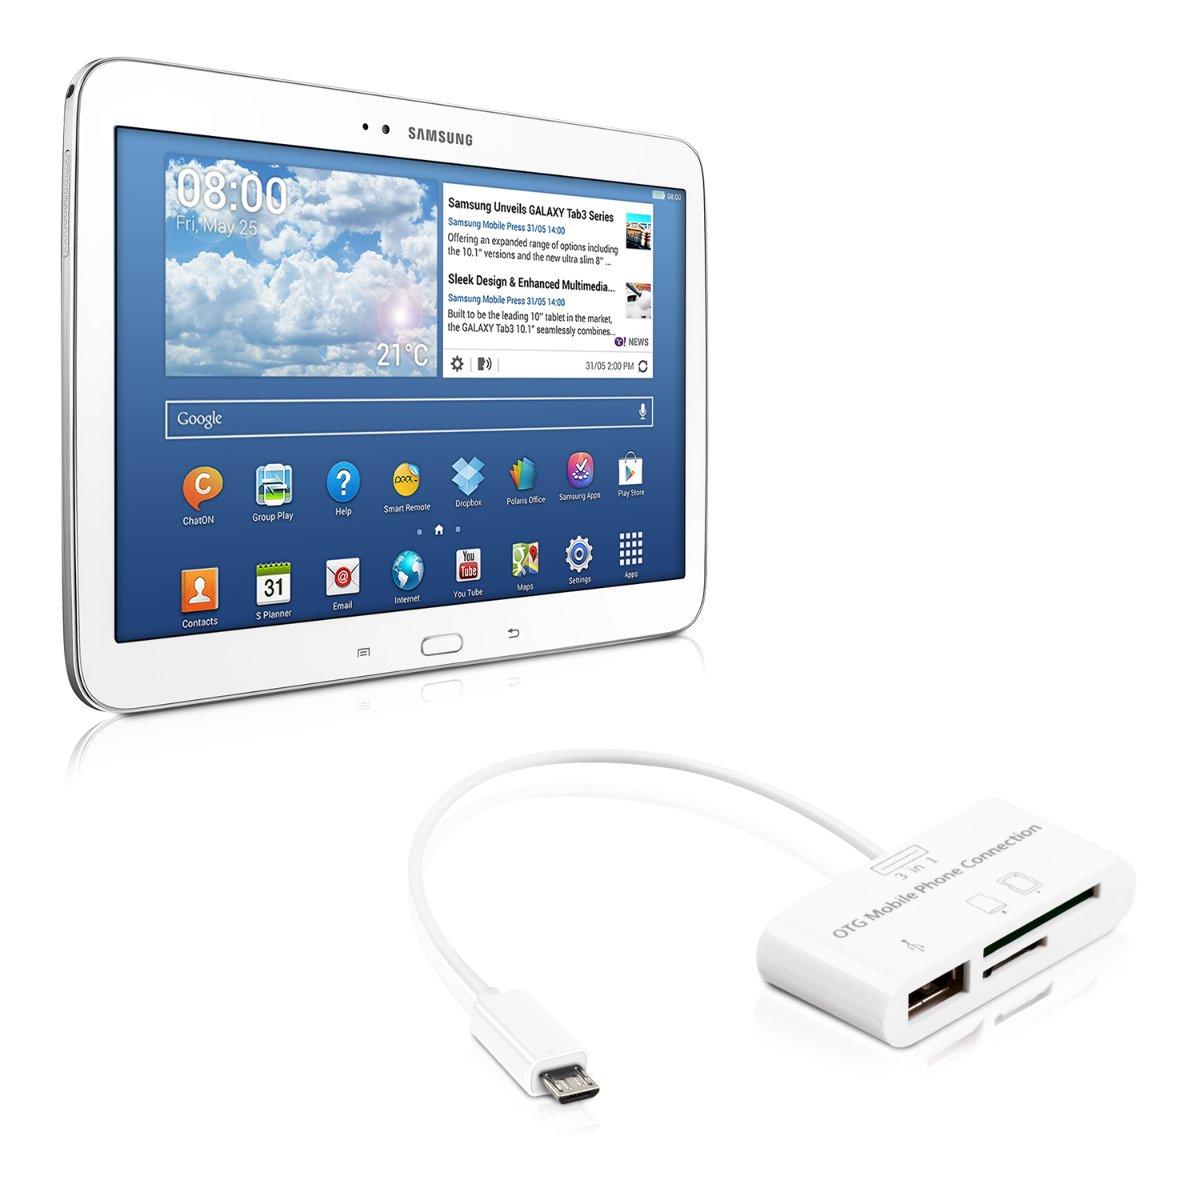 kwmobile 3in1 Micro adattatore della carta Reader USB OTG per Samsung Galaxy Tab 4 10.1 T530 / T531 / T535 bianco KW-Commerce 29309